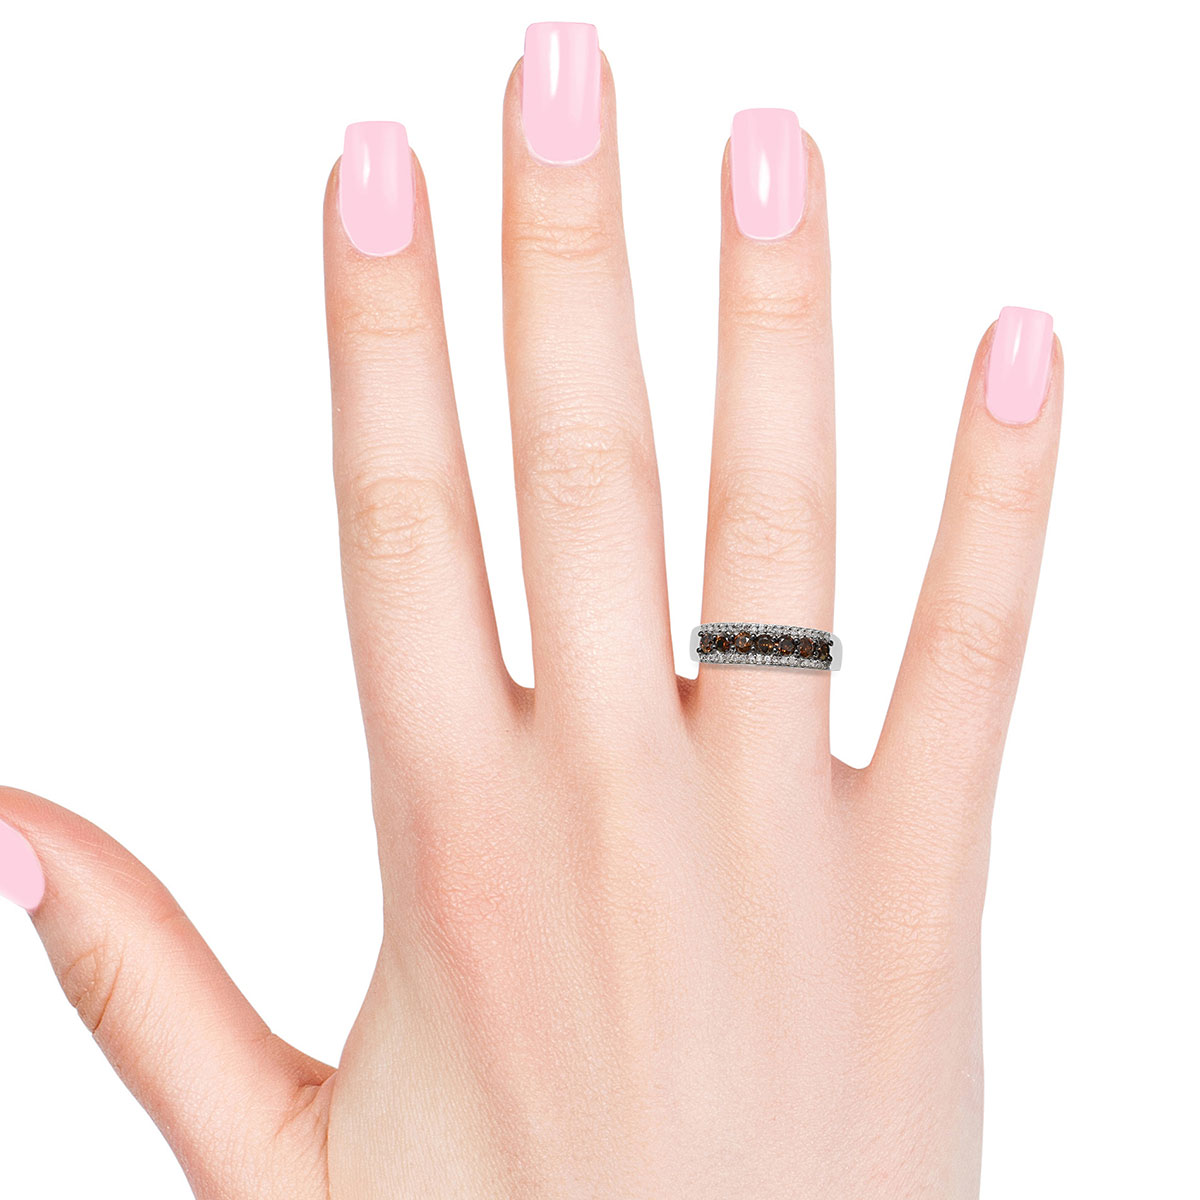 Red Diamond (IR), Diamond (0.20 ct) Ring in Rhodium & Platinum Over Sterling Silver (Size 7.0) 1.00 ctw